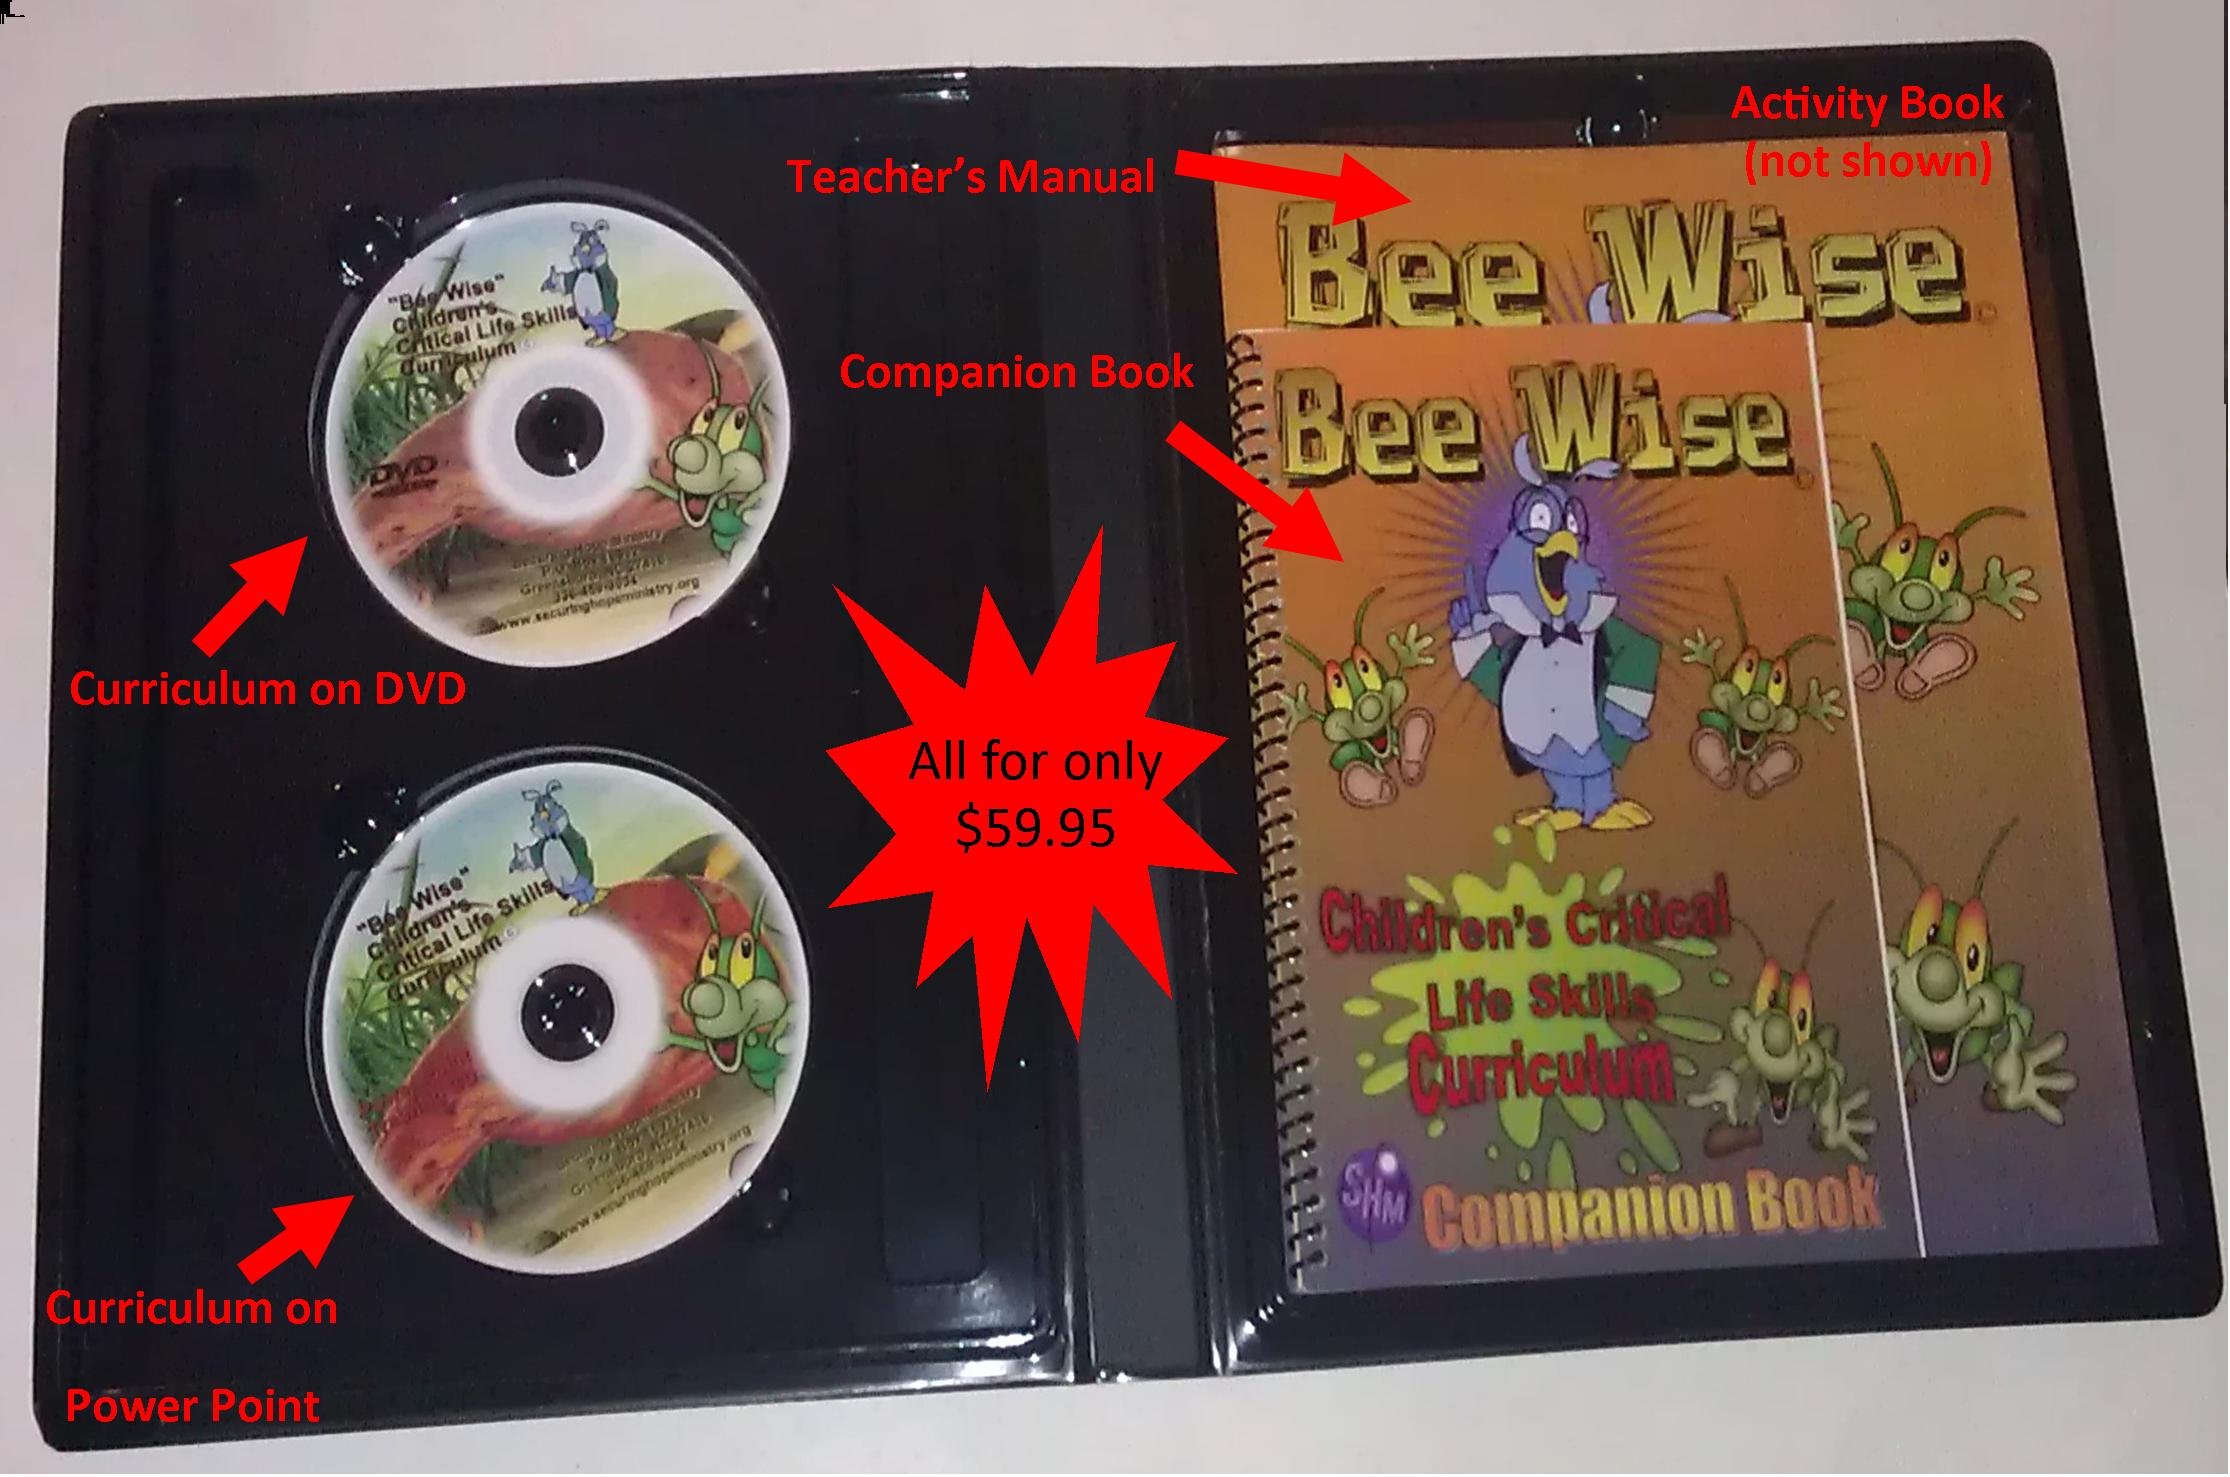 Bee Wise: Children's Critical Life Skills Curriculum